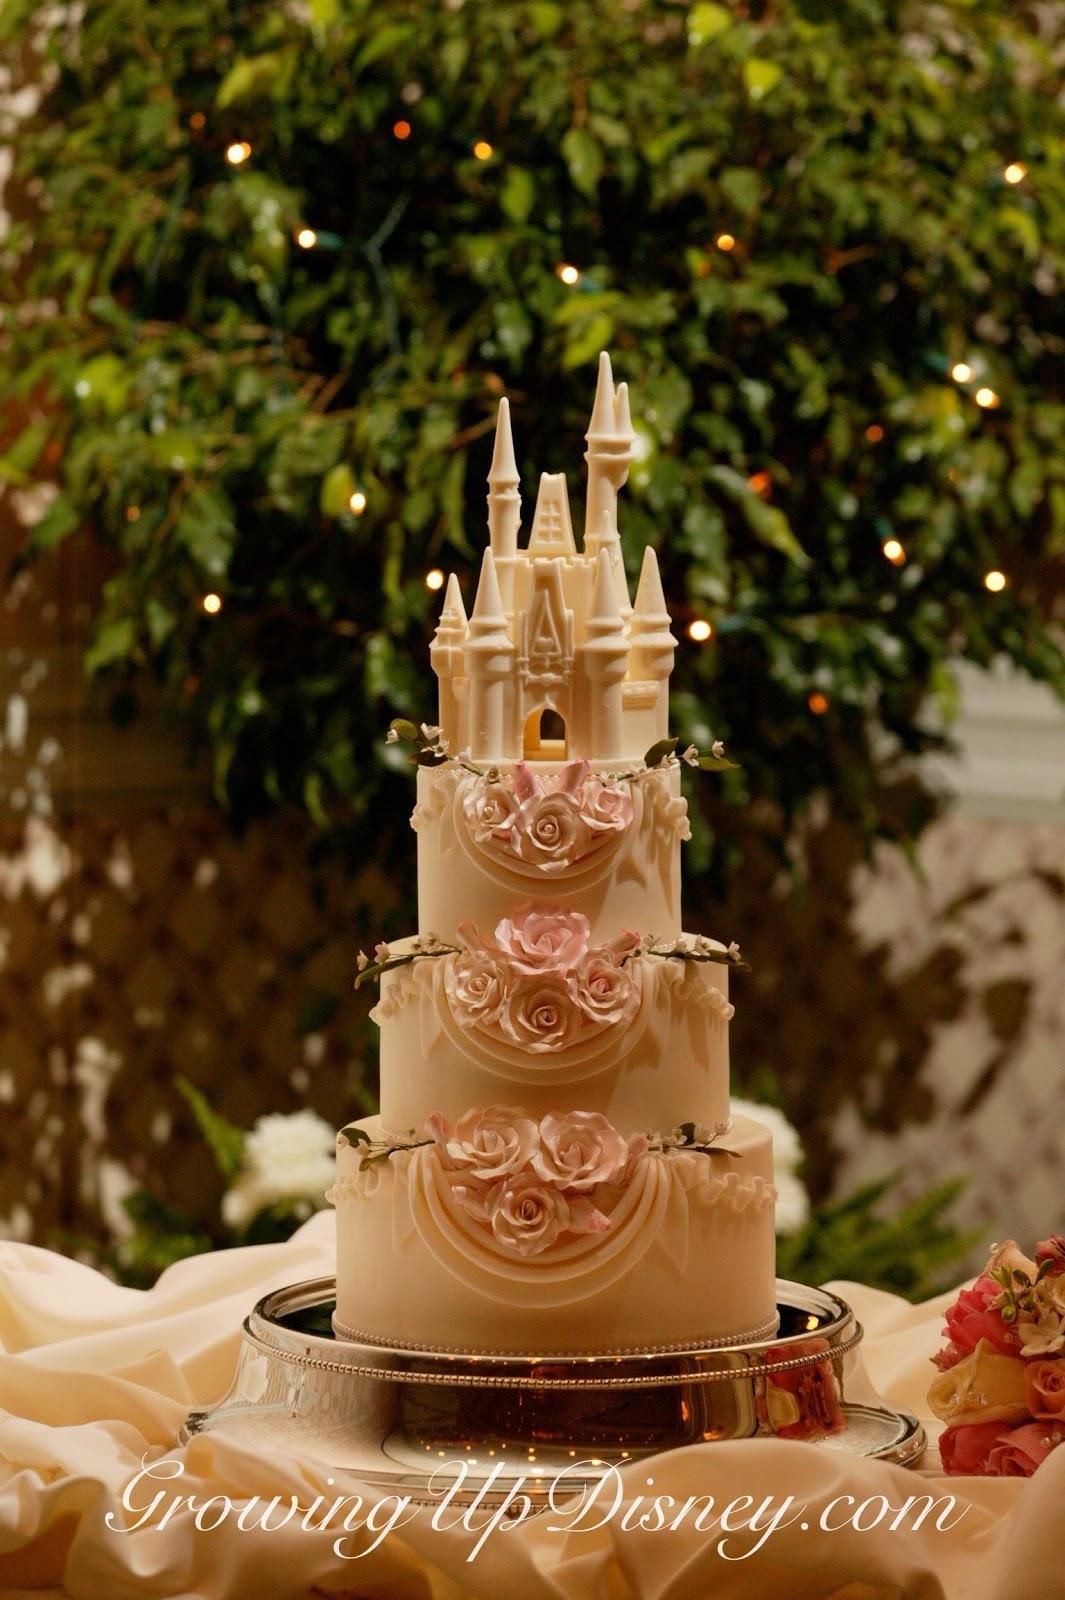 Growing Up Disney: Disney's Fairy Tale Weddings: Photos ...